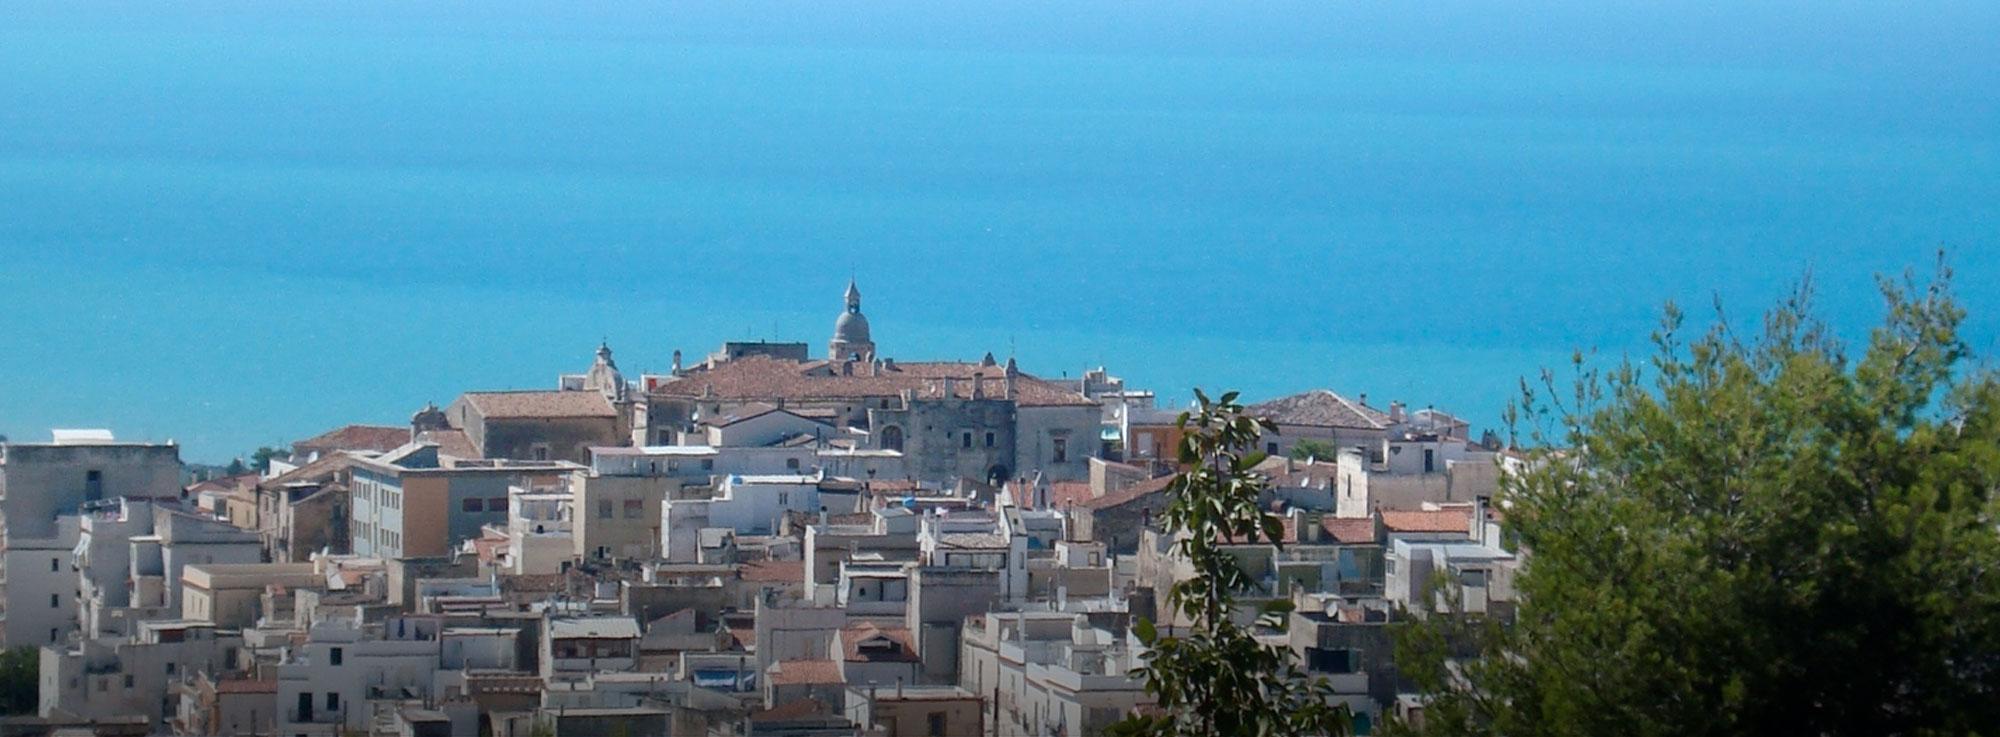 Ischitella: Festa di Sant'Eustachio